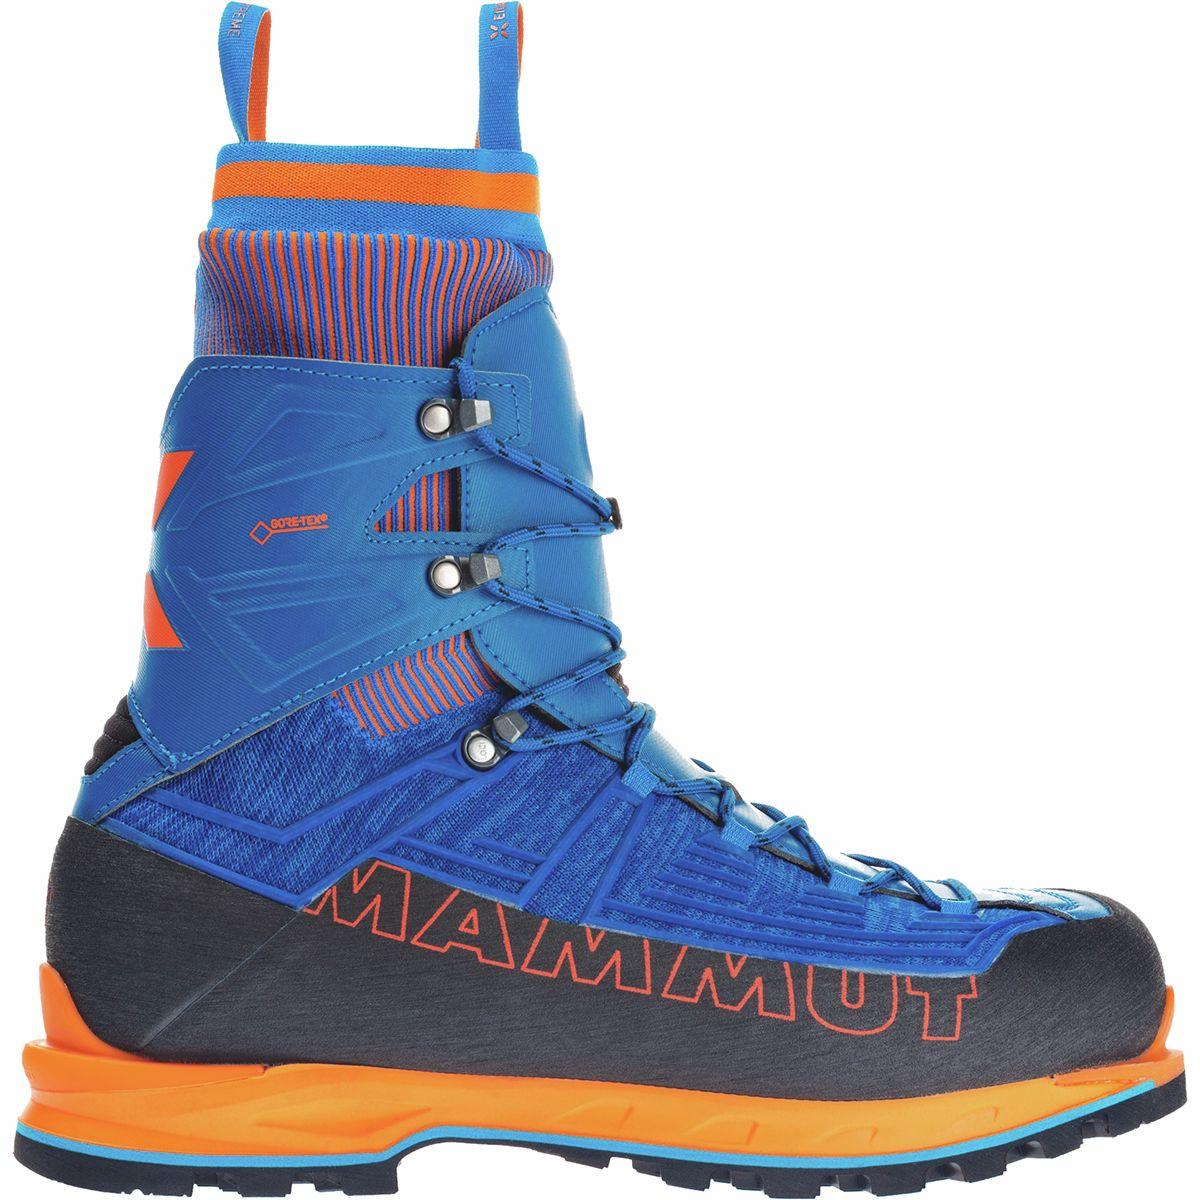 photo: Mammut Nordwand Knit High GTX mountaineering boot